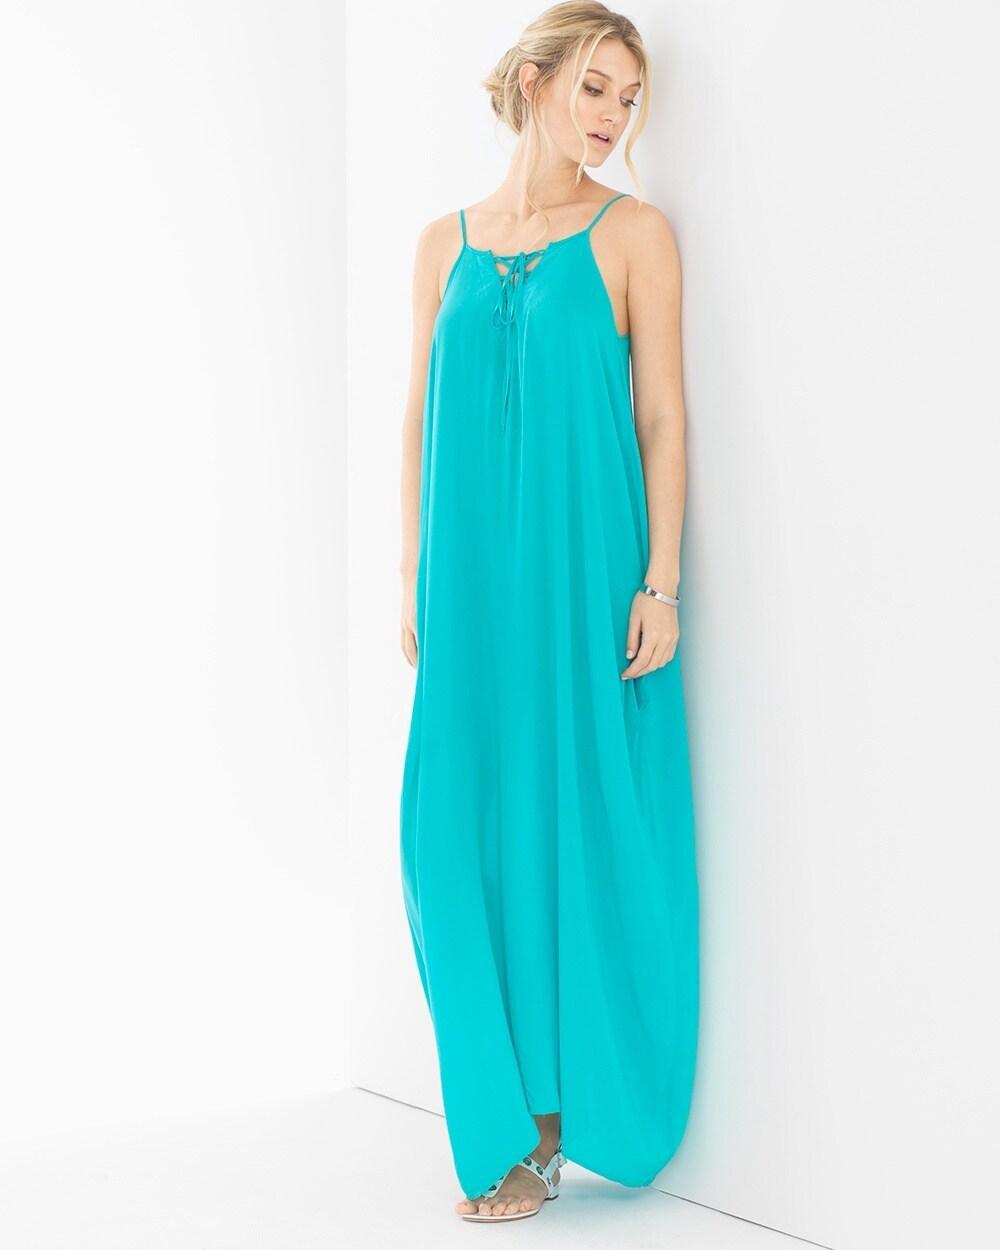 9593aed97ff Elan Lace Up Neck Cover Up Maxi Dress Aqua - Soma